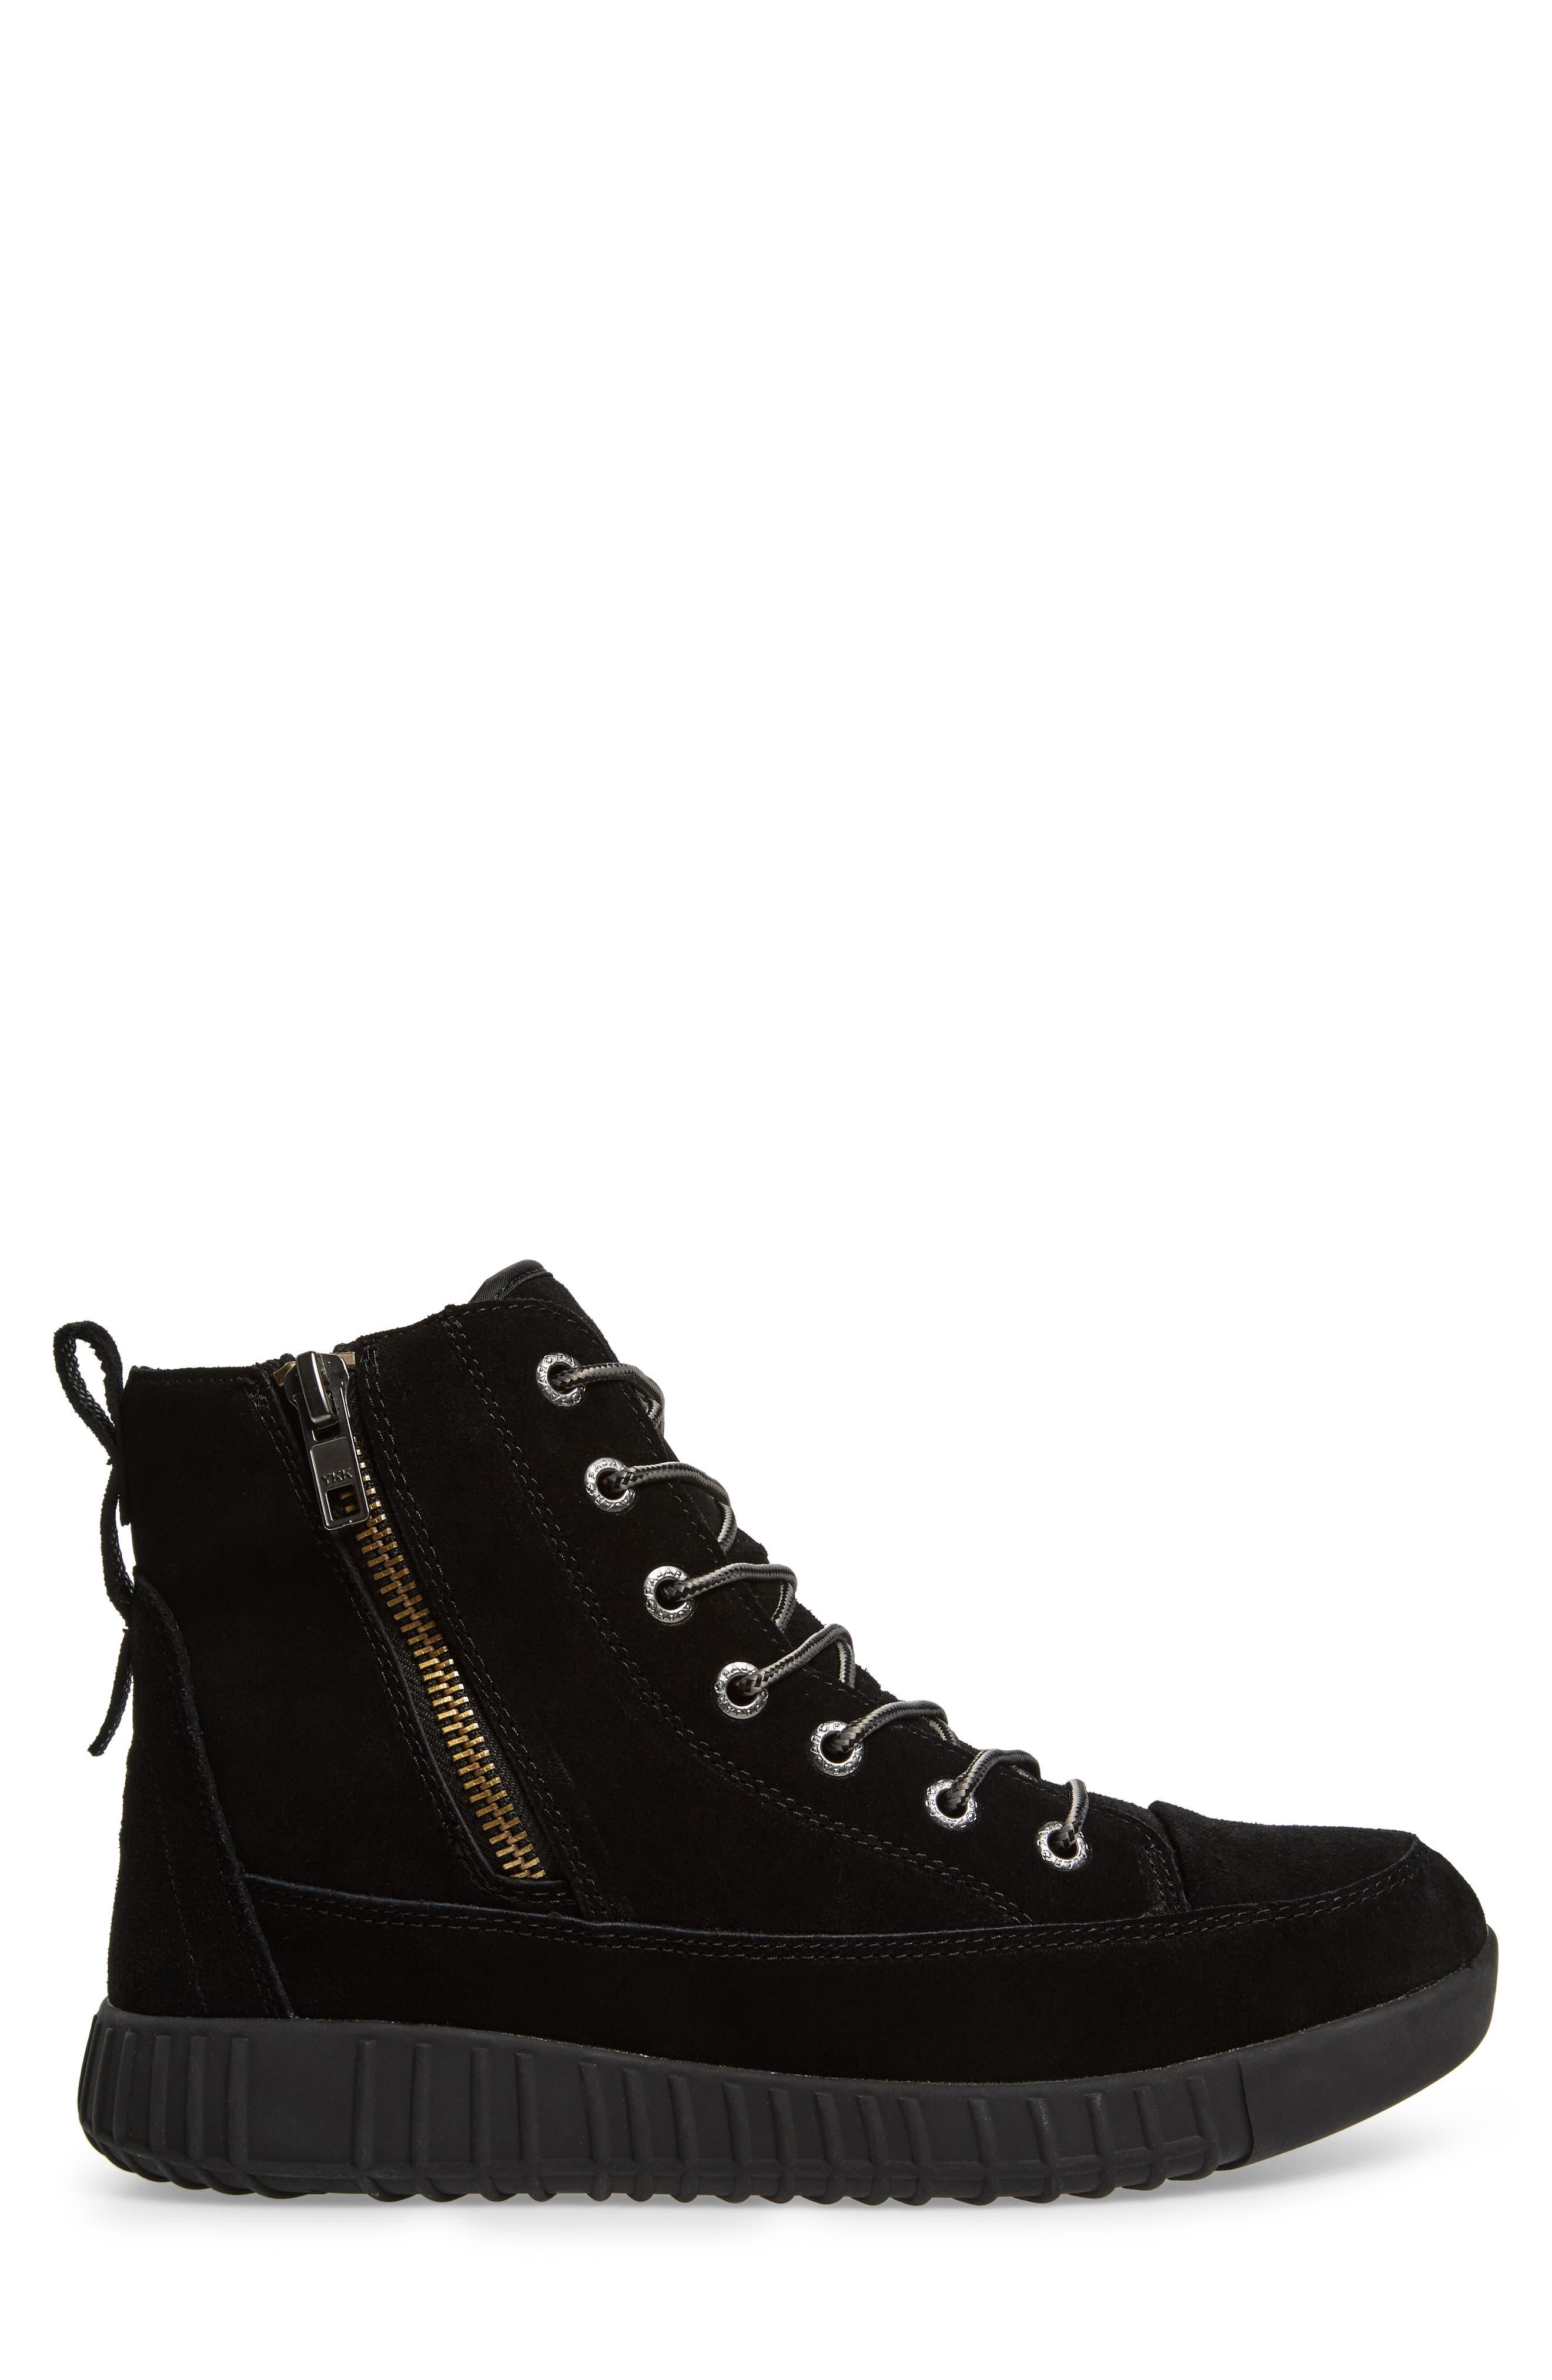 PAJAR,                             Parnell Waterproof Winter Sneaker,                             Alternate thumbnail 3, color,                             001